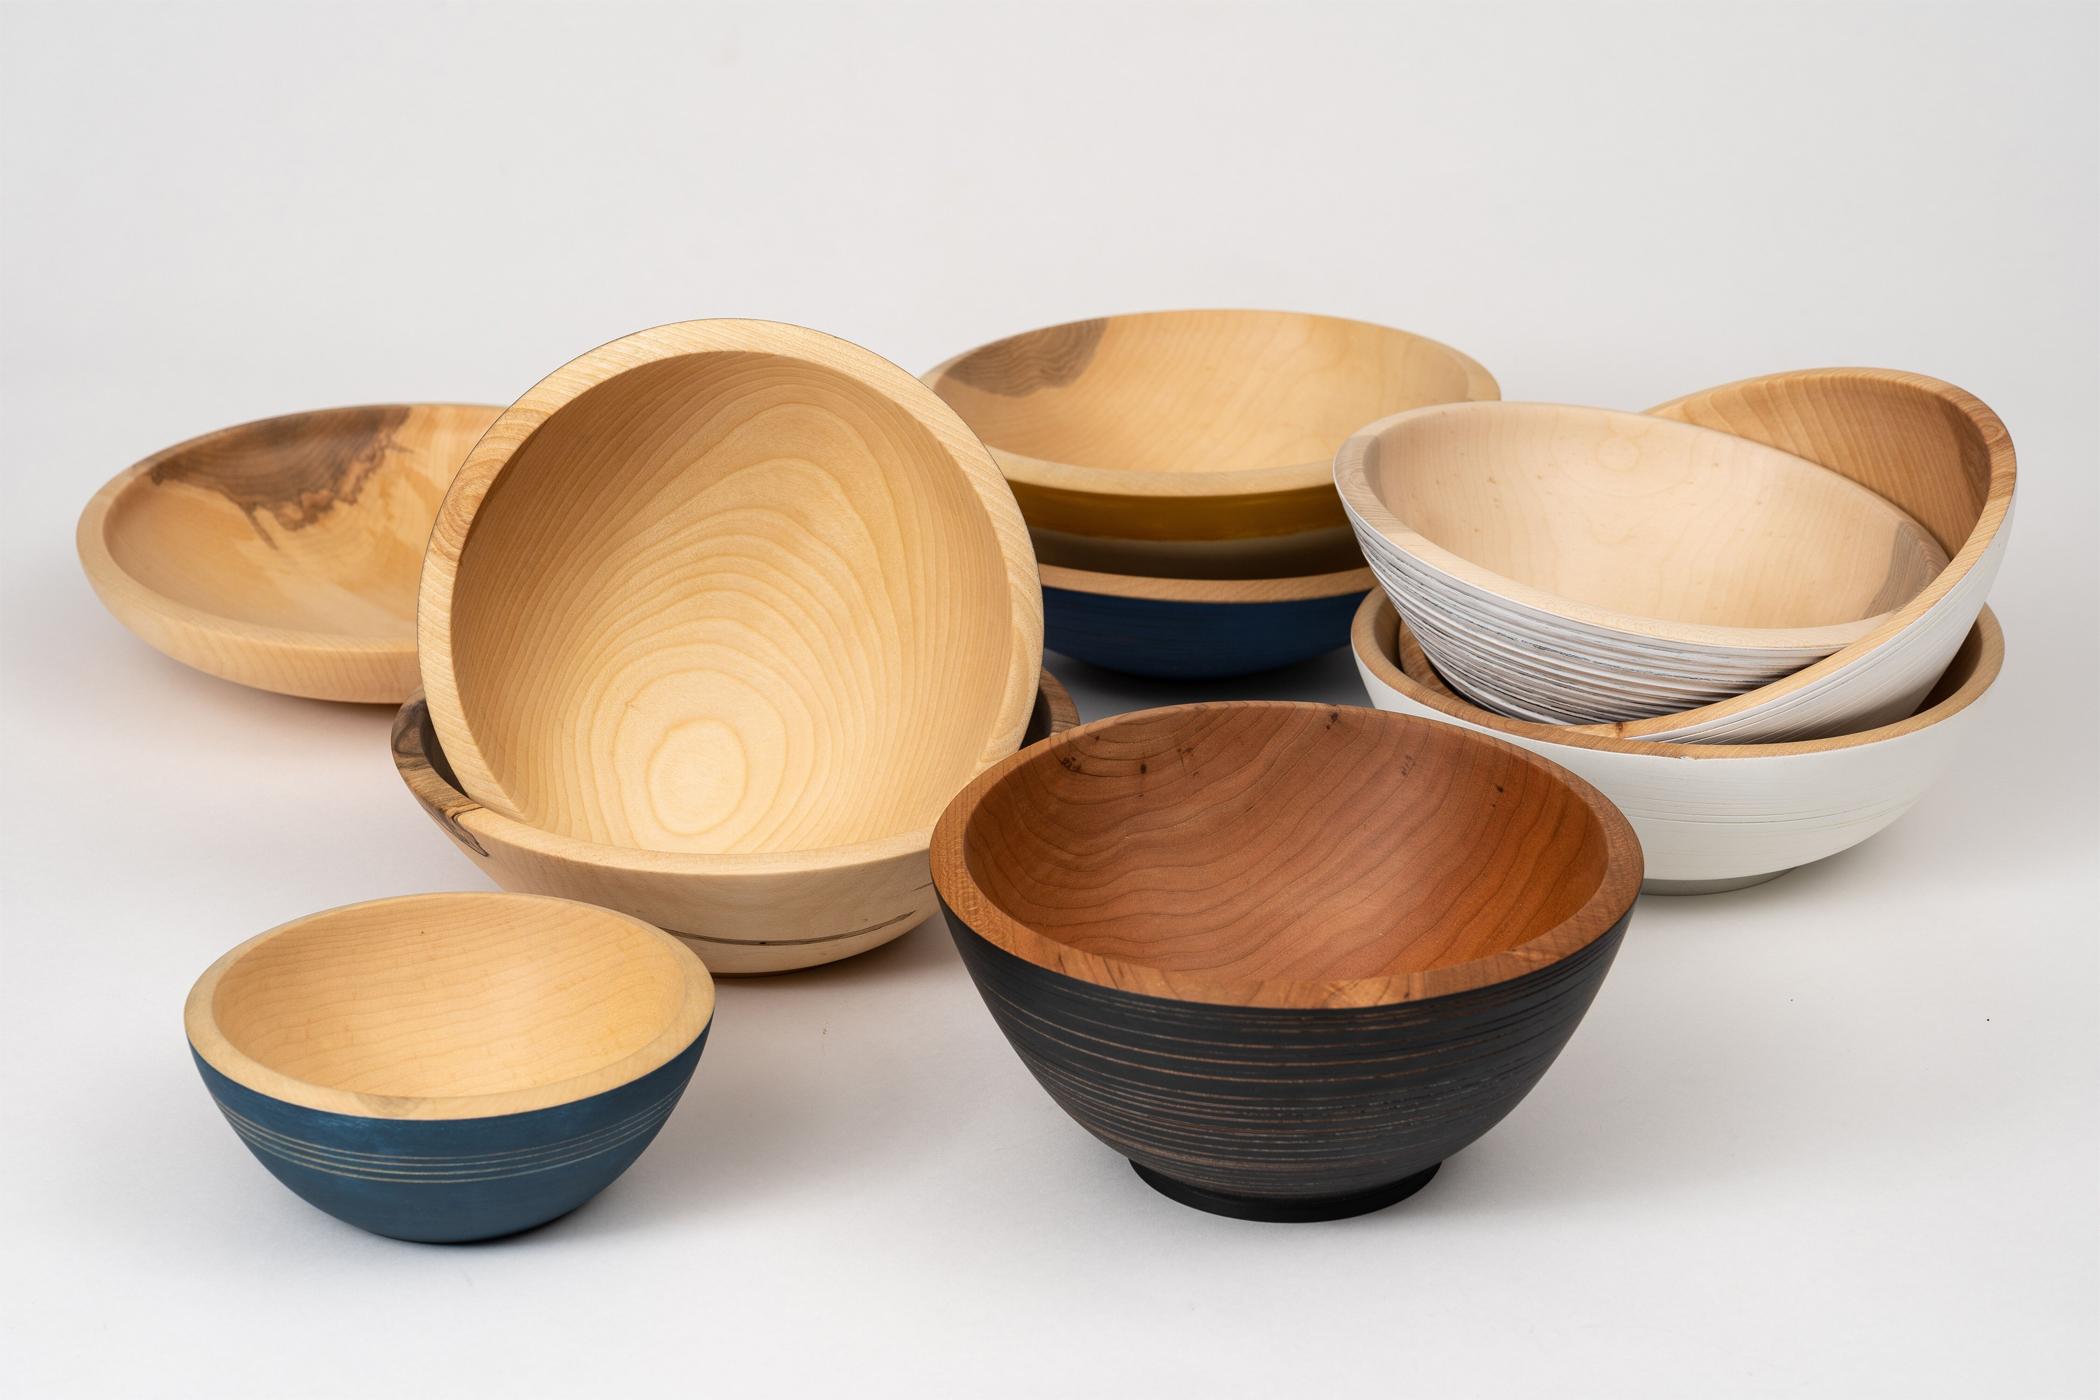 dean-babin-hand-crafted-wooden-bowls.jpeg